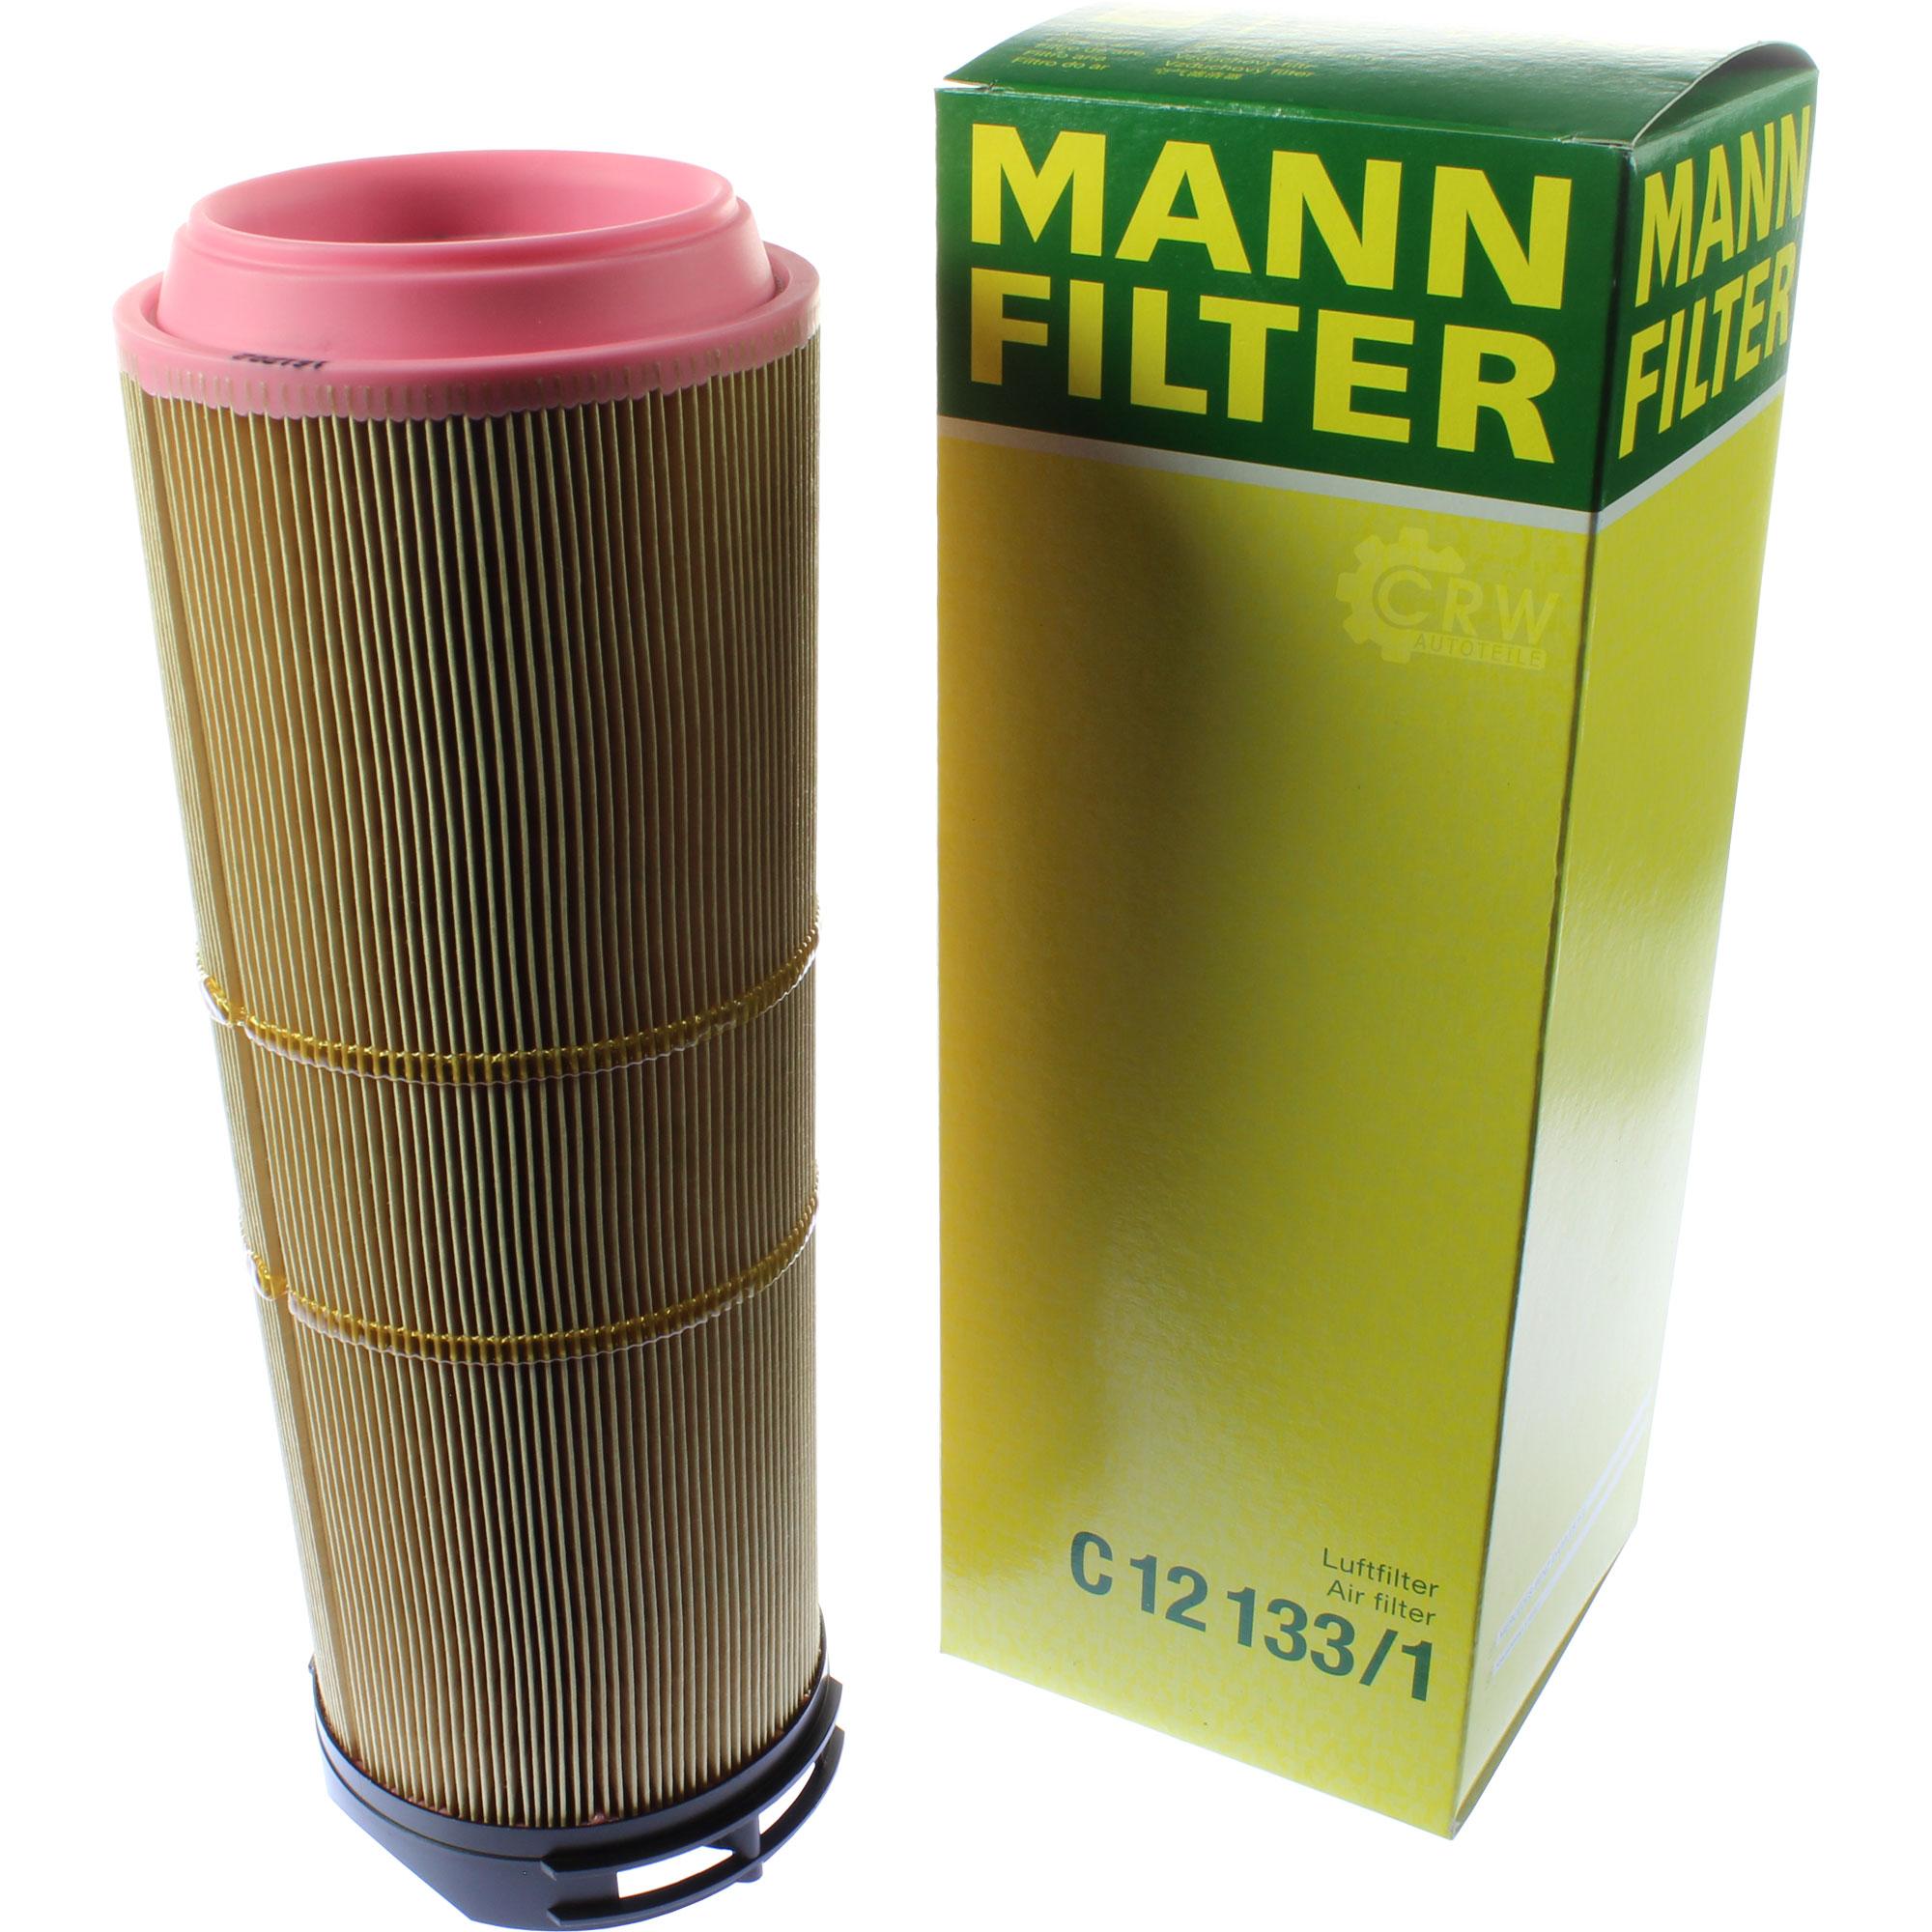 MANNOL-7-L-Energy-Premium-5W-30-MANN-FILTER-Mercedes-C-Klasse-W204-C-220-CDI Indexbild 5